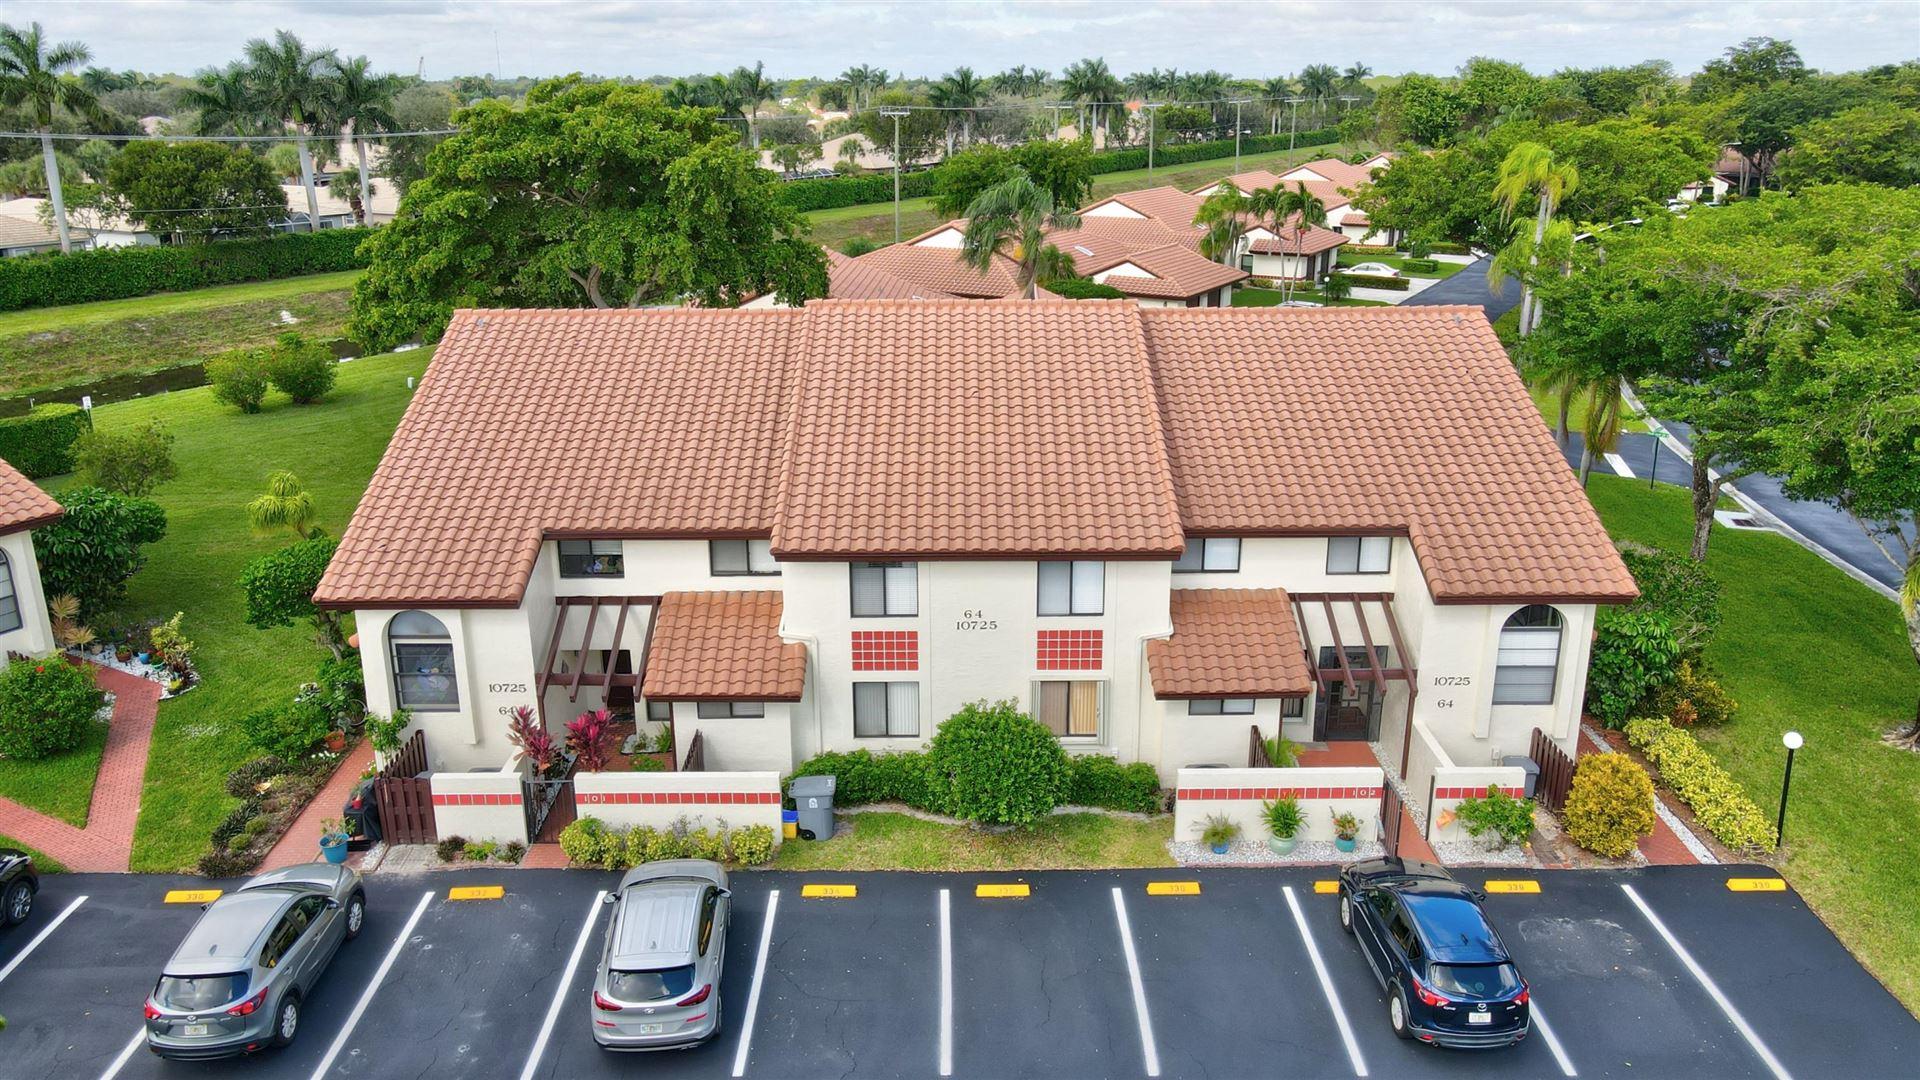 10725 Bahama Palm Way #201, Boynton Beach, FL 33437 - #: RX-10668849